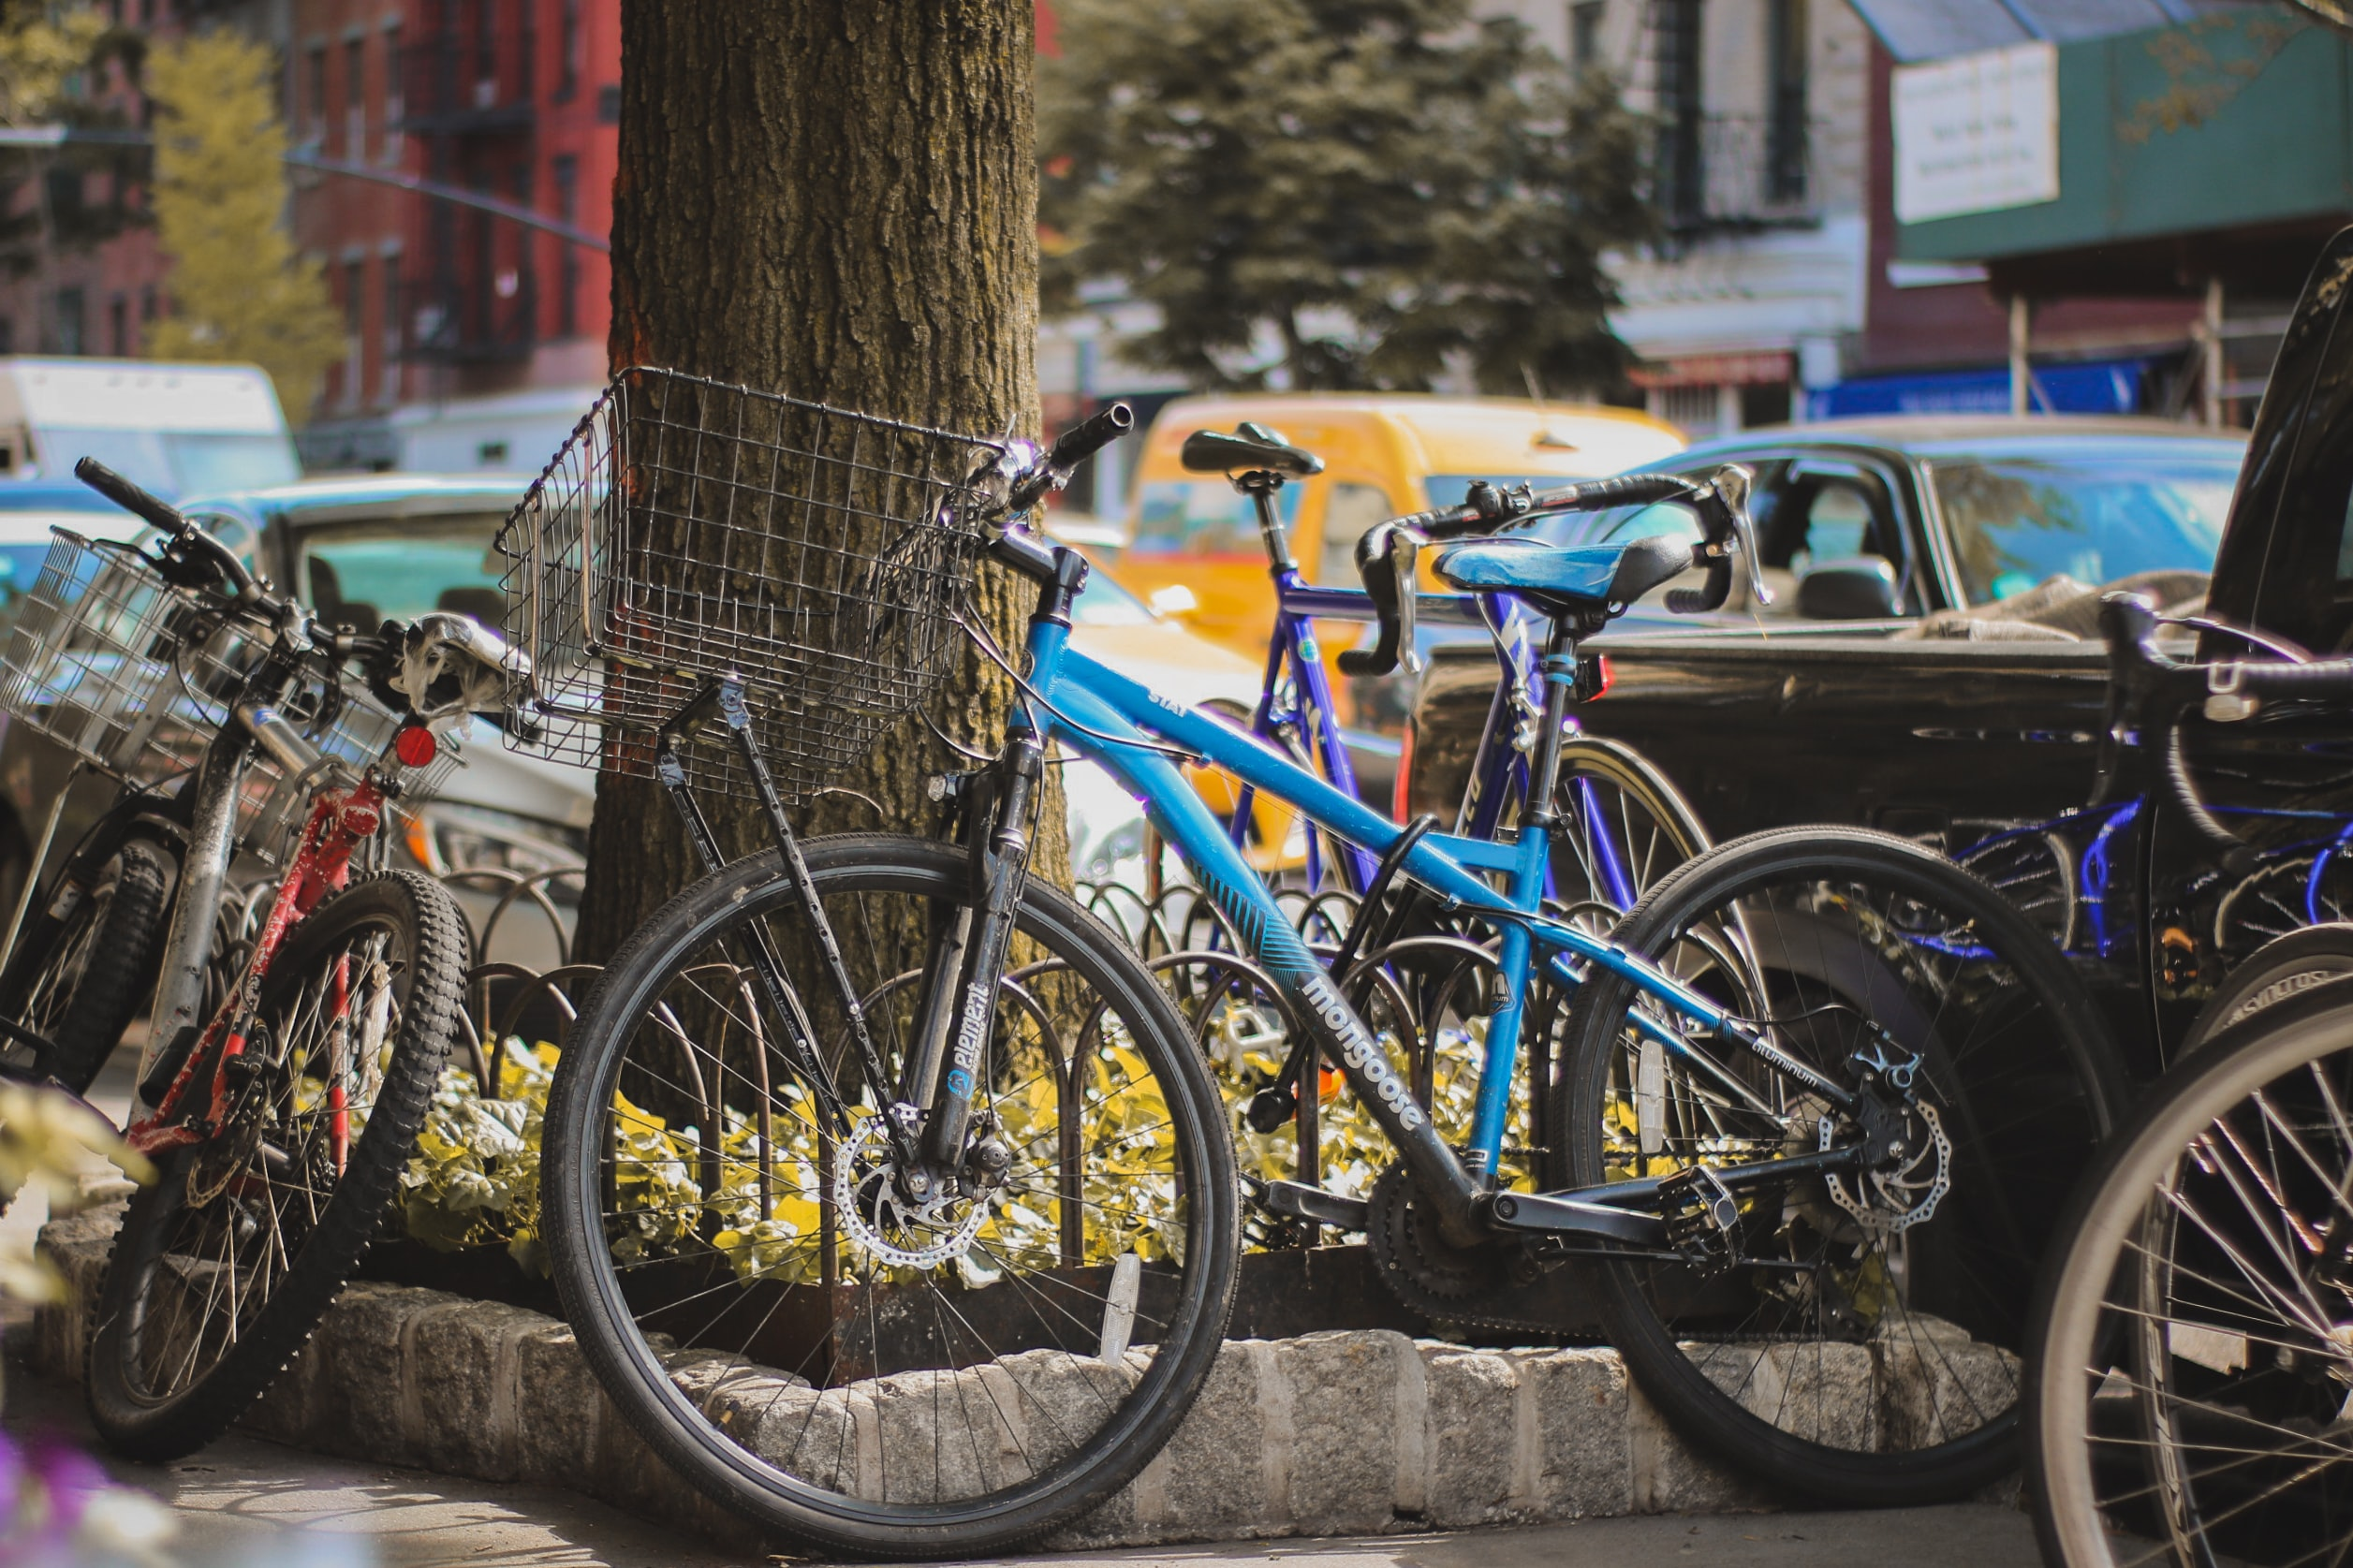 blue bike leaning on tre